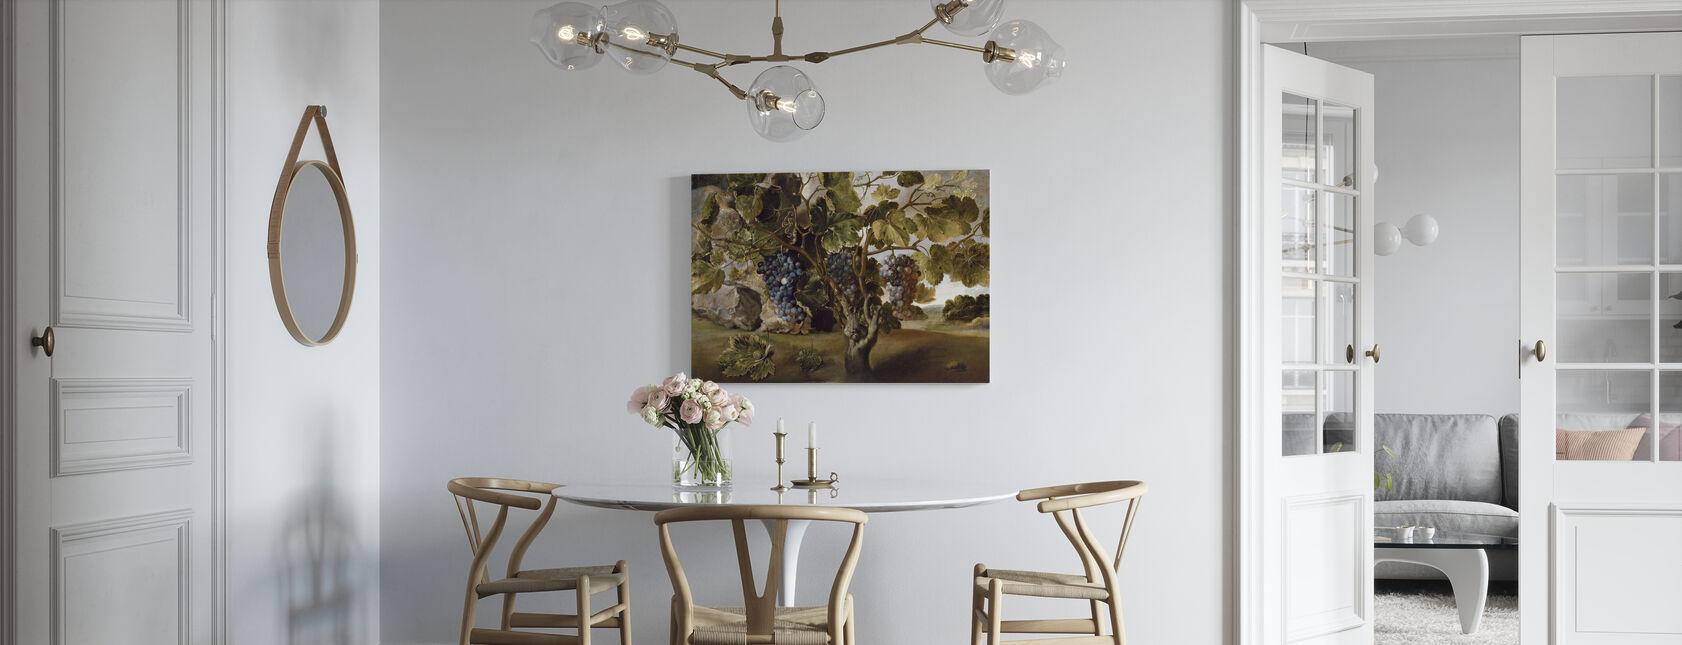 Gravepine - Tomas Hiepes - Canvas print - Kitchen